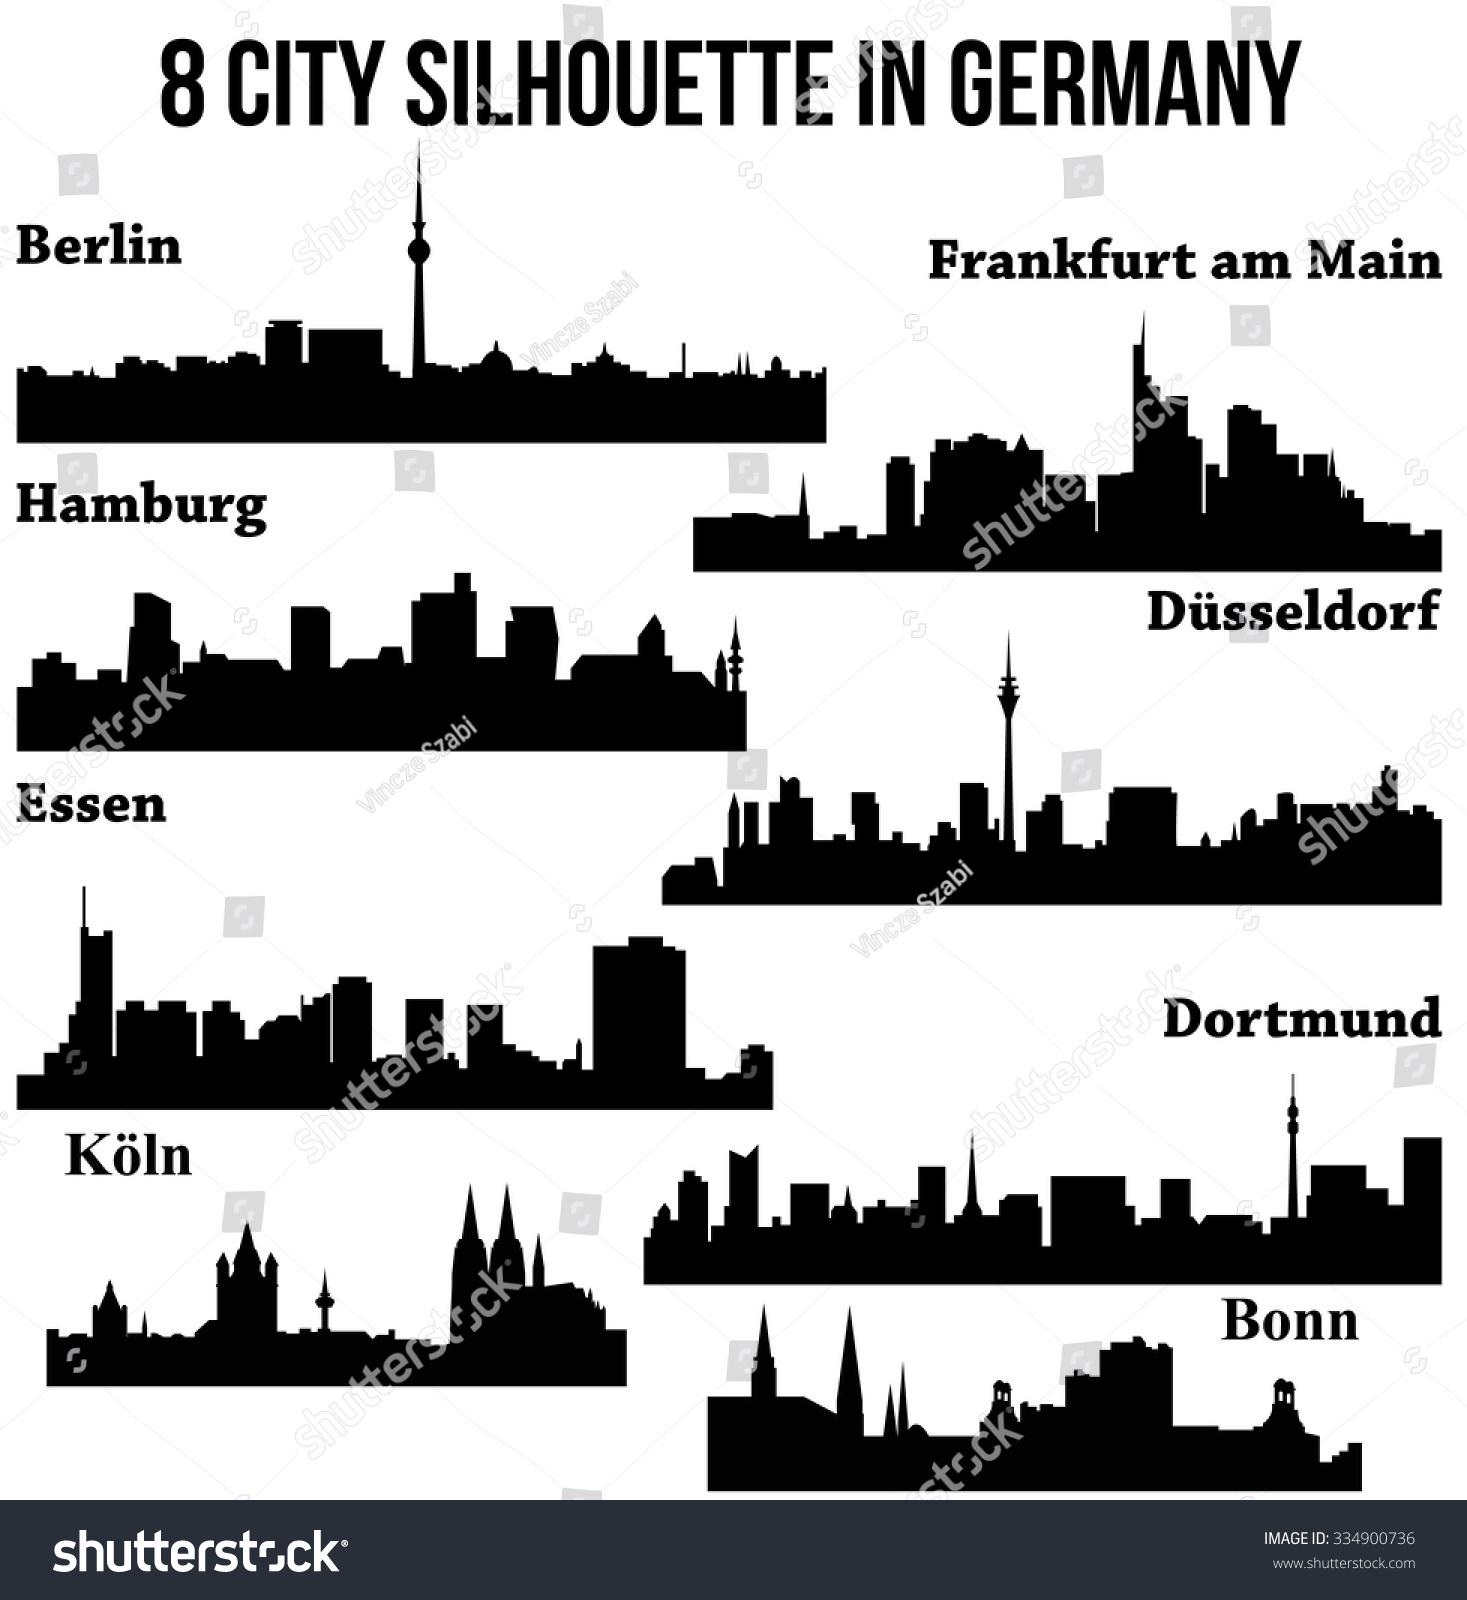 8 city in germany deutschland berlin hamburg essen. Black Bedroom Furniture Sets. Home Design Ideas